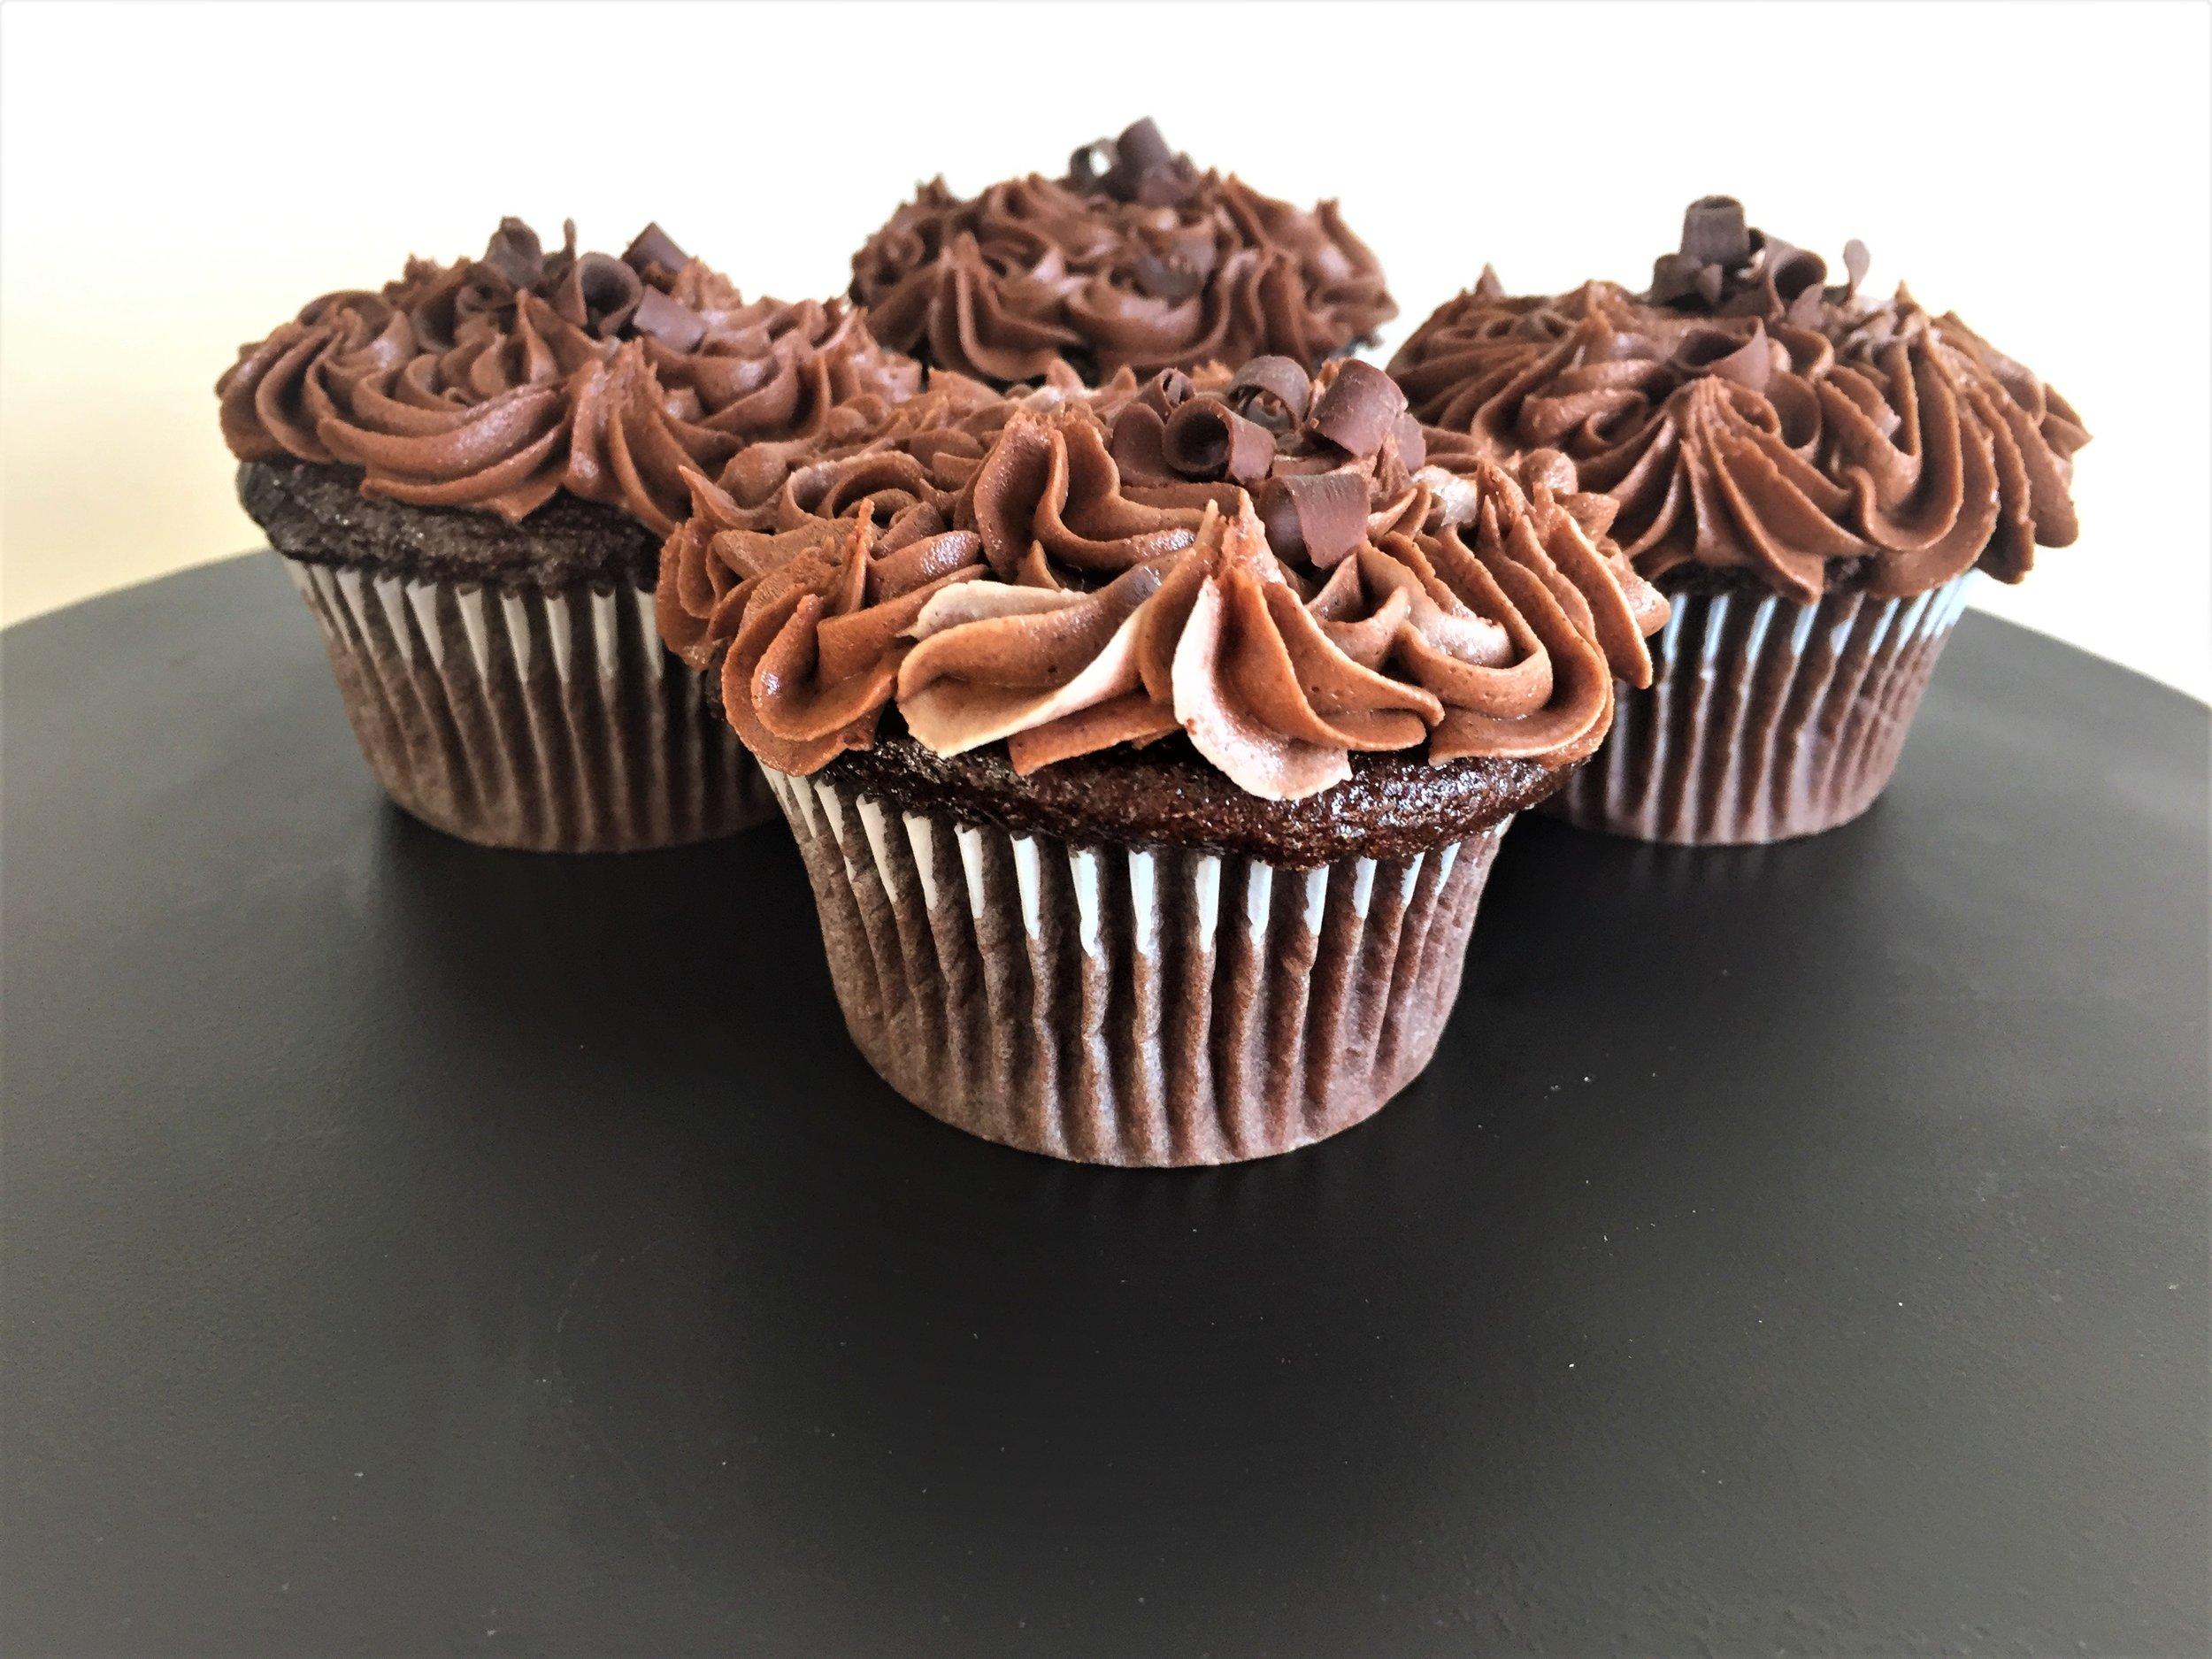 Gateaux Bakery & Cafe National Chocolate Cake Day Jan 27.JPG